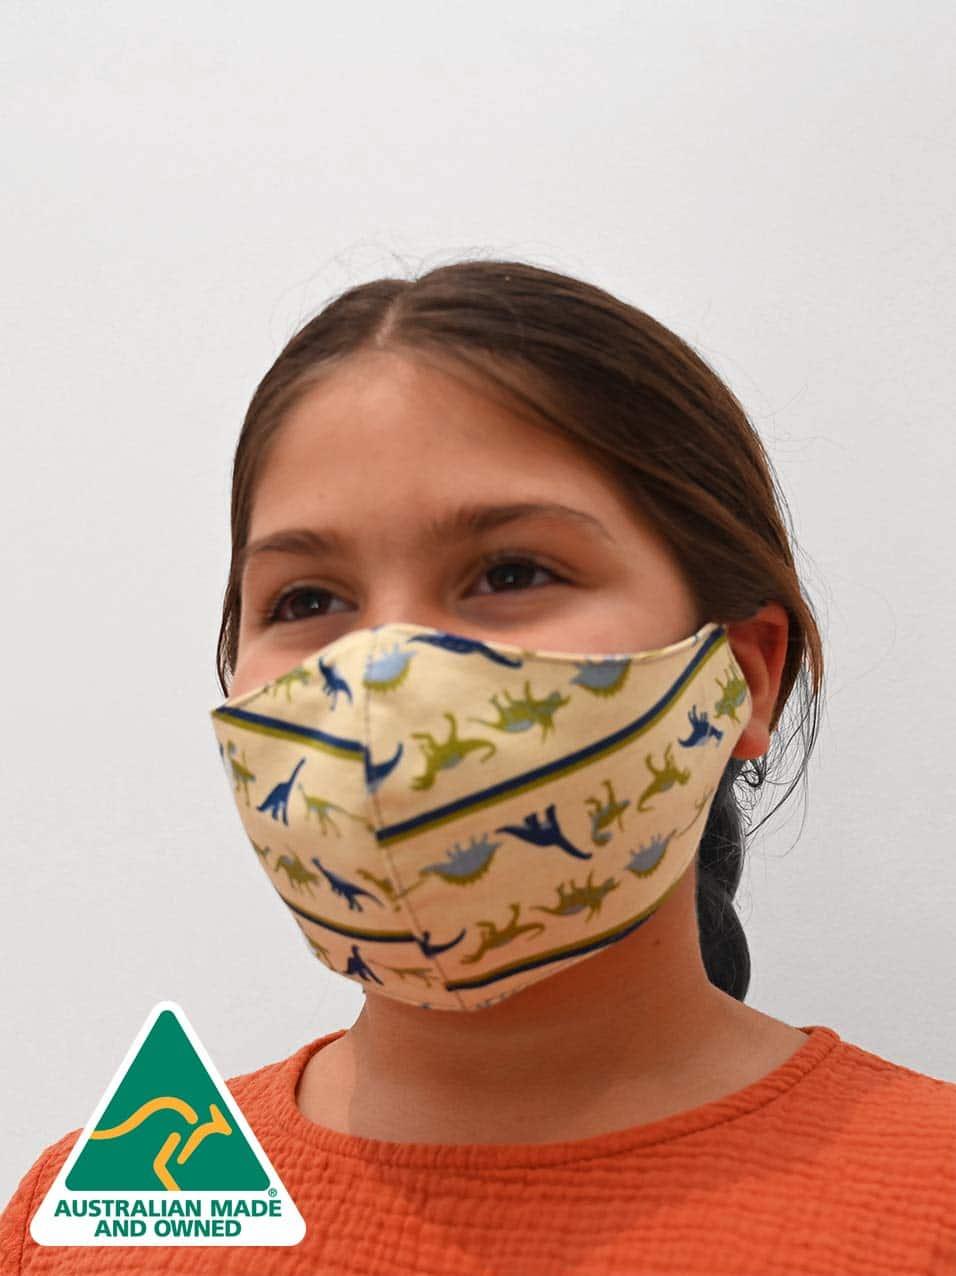 Children's Face Masks (Reusable)